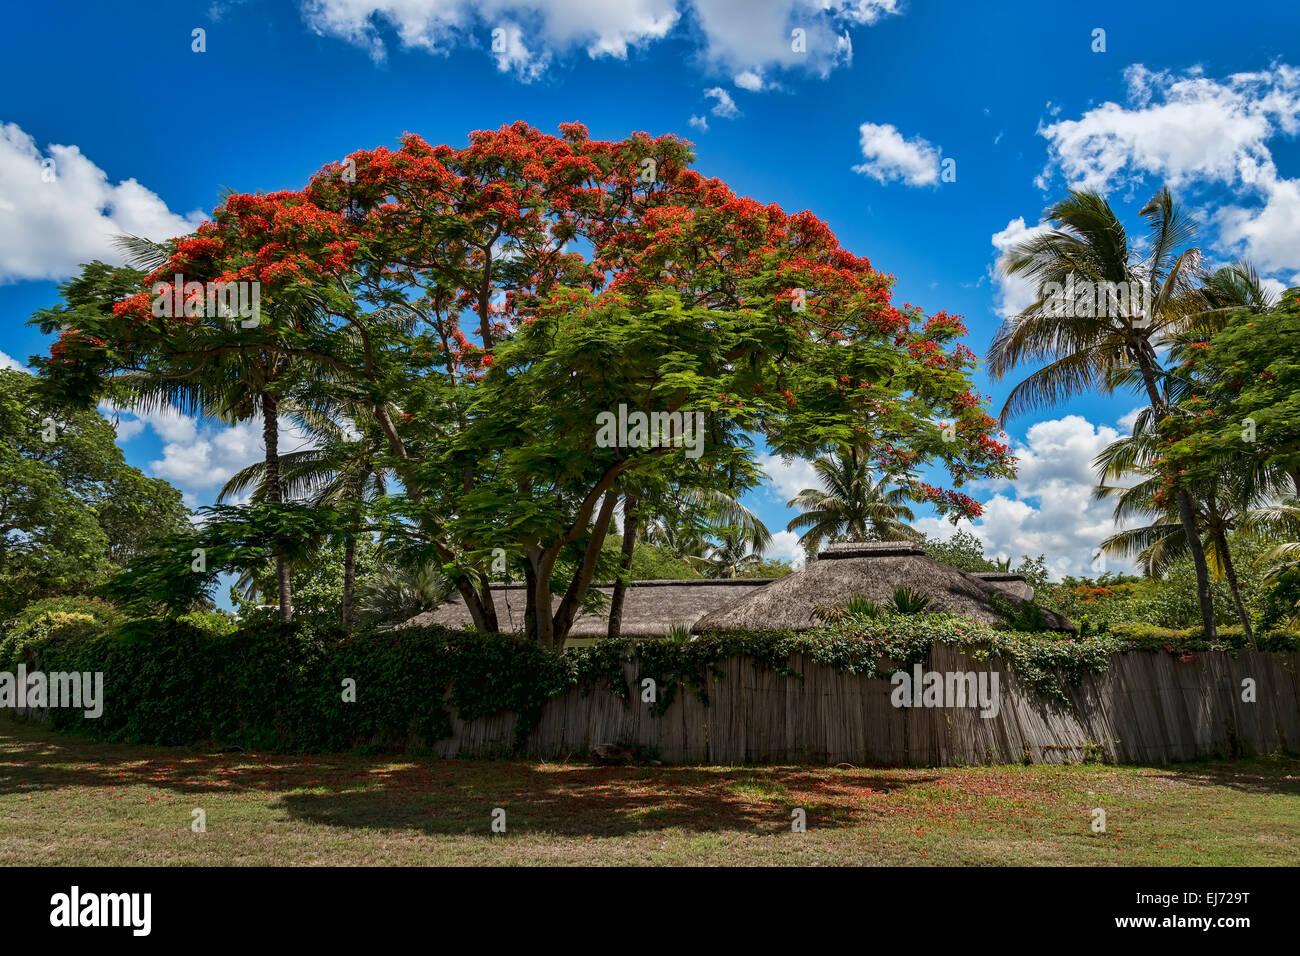 Royal Poinciana (Delonix regia) in front of hut, Mauritius - Stock Image